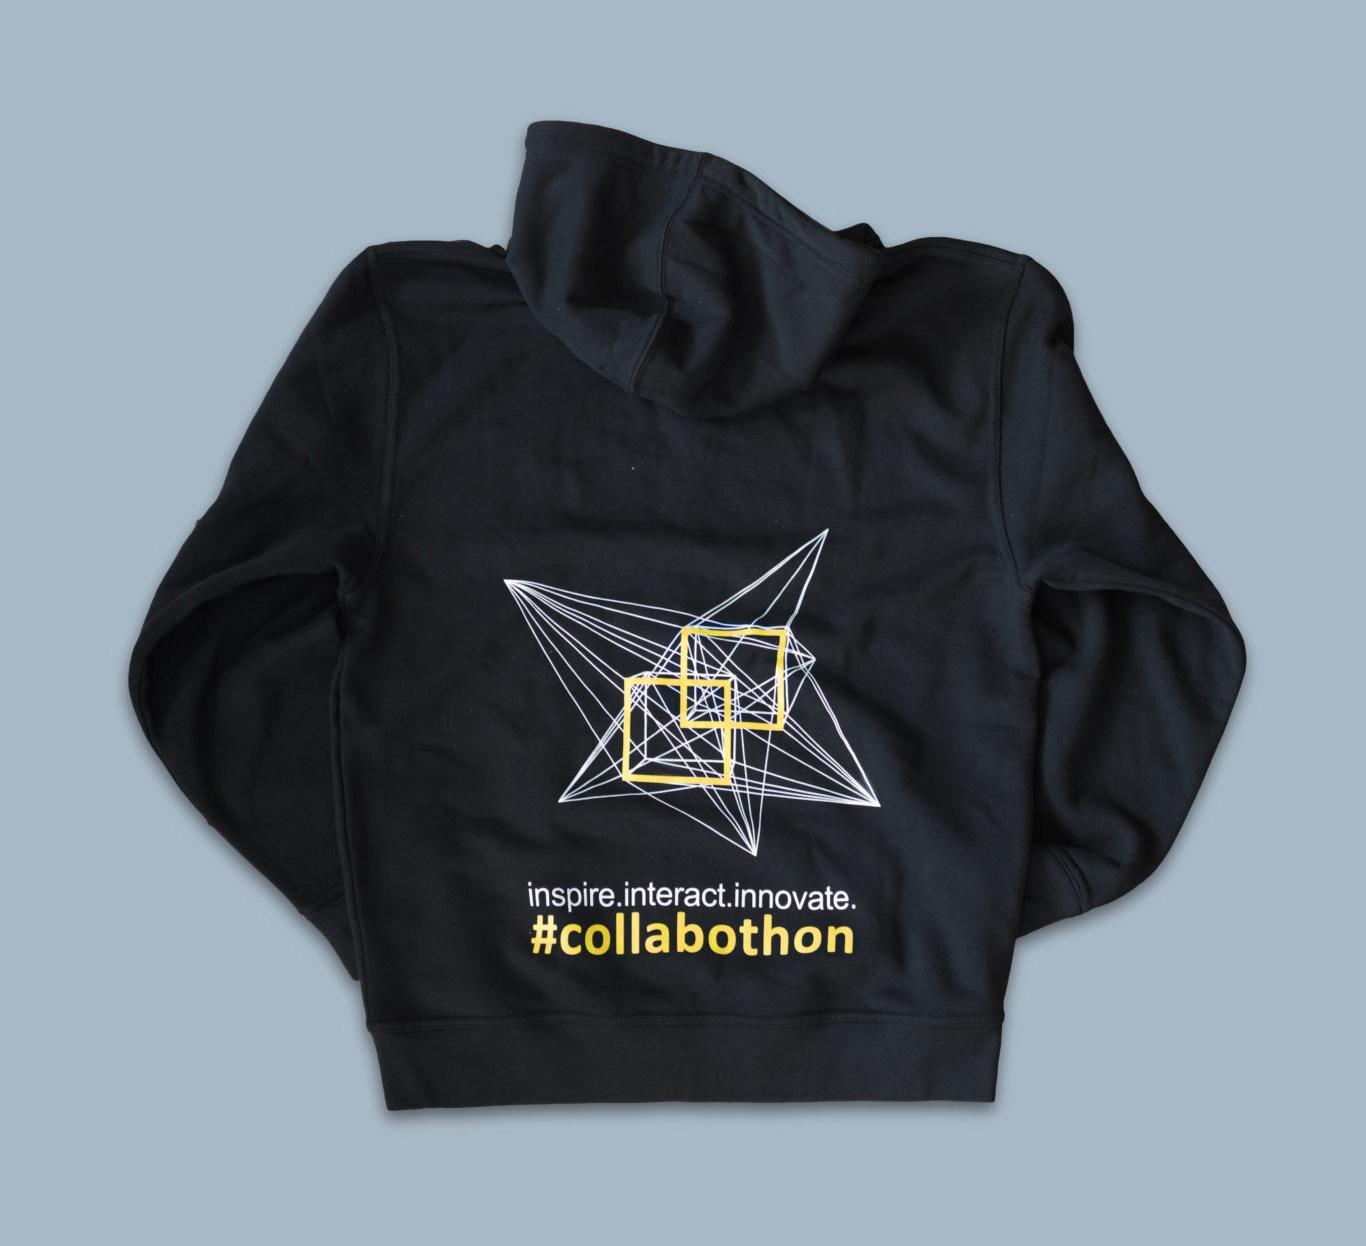 Collabothon